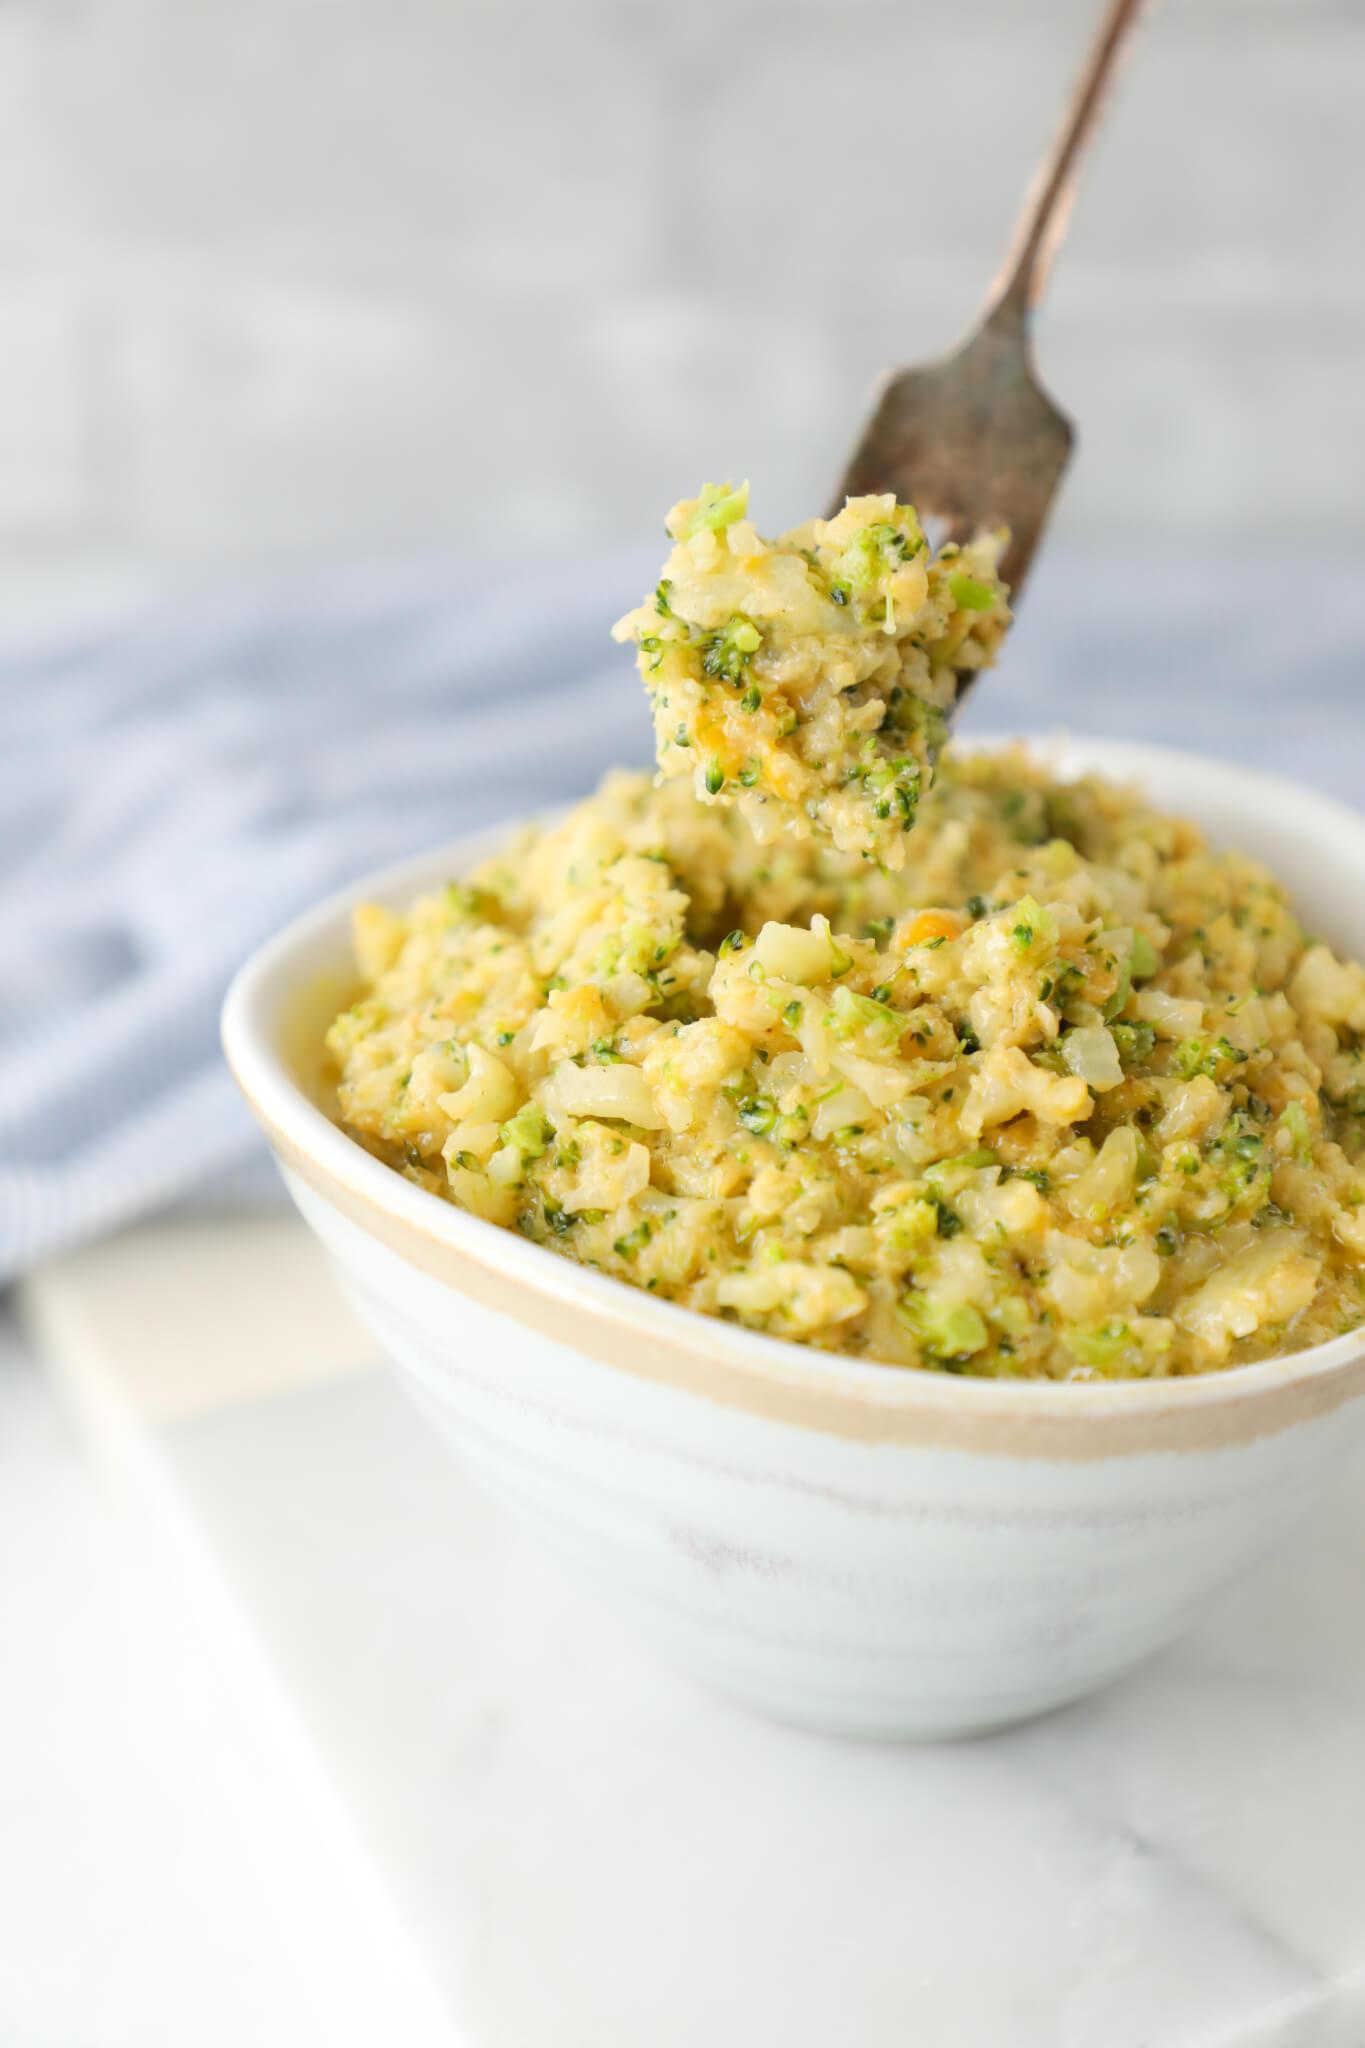 Cauliflower Rice Keto  Keto Cheesy Broccoli & Cauliflower Rice